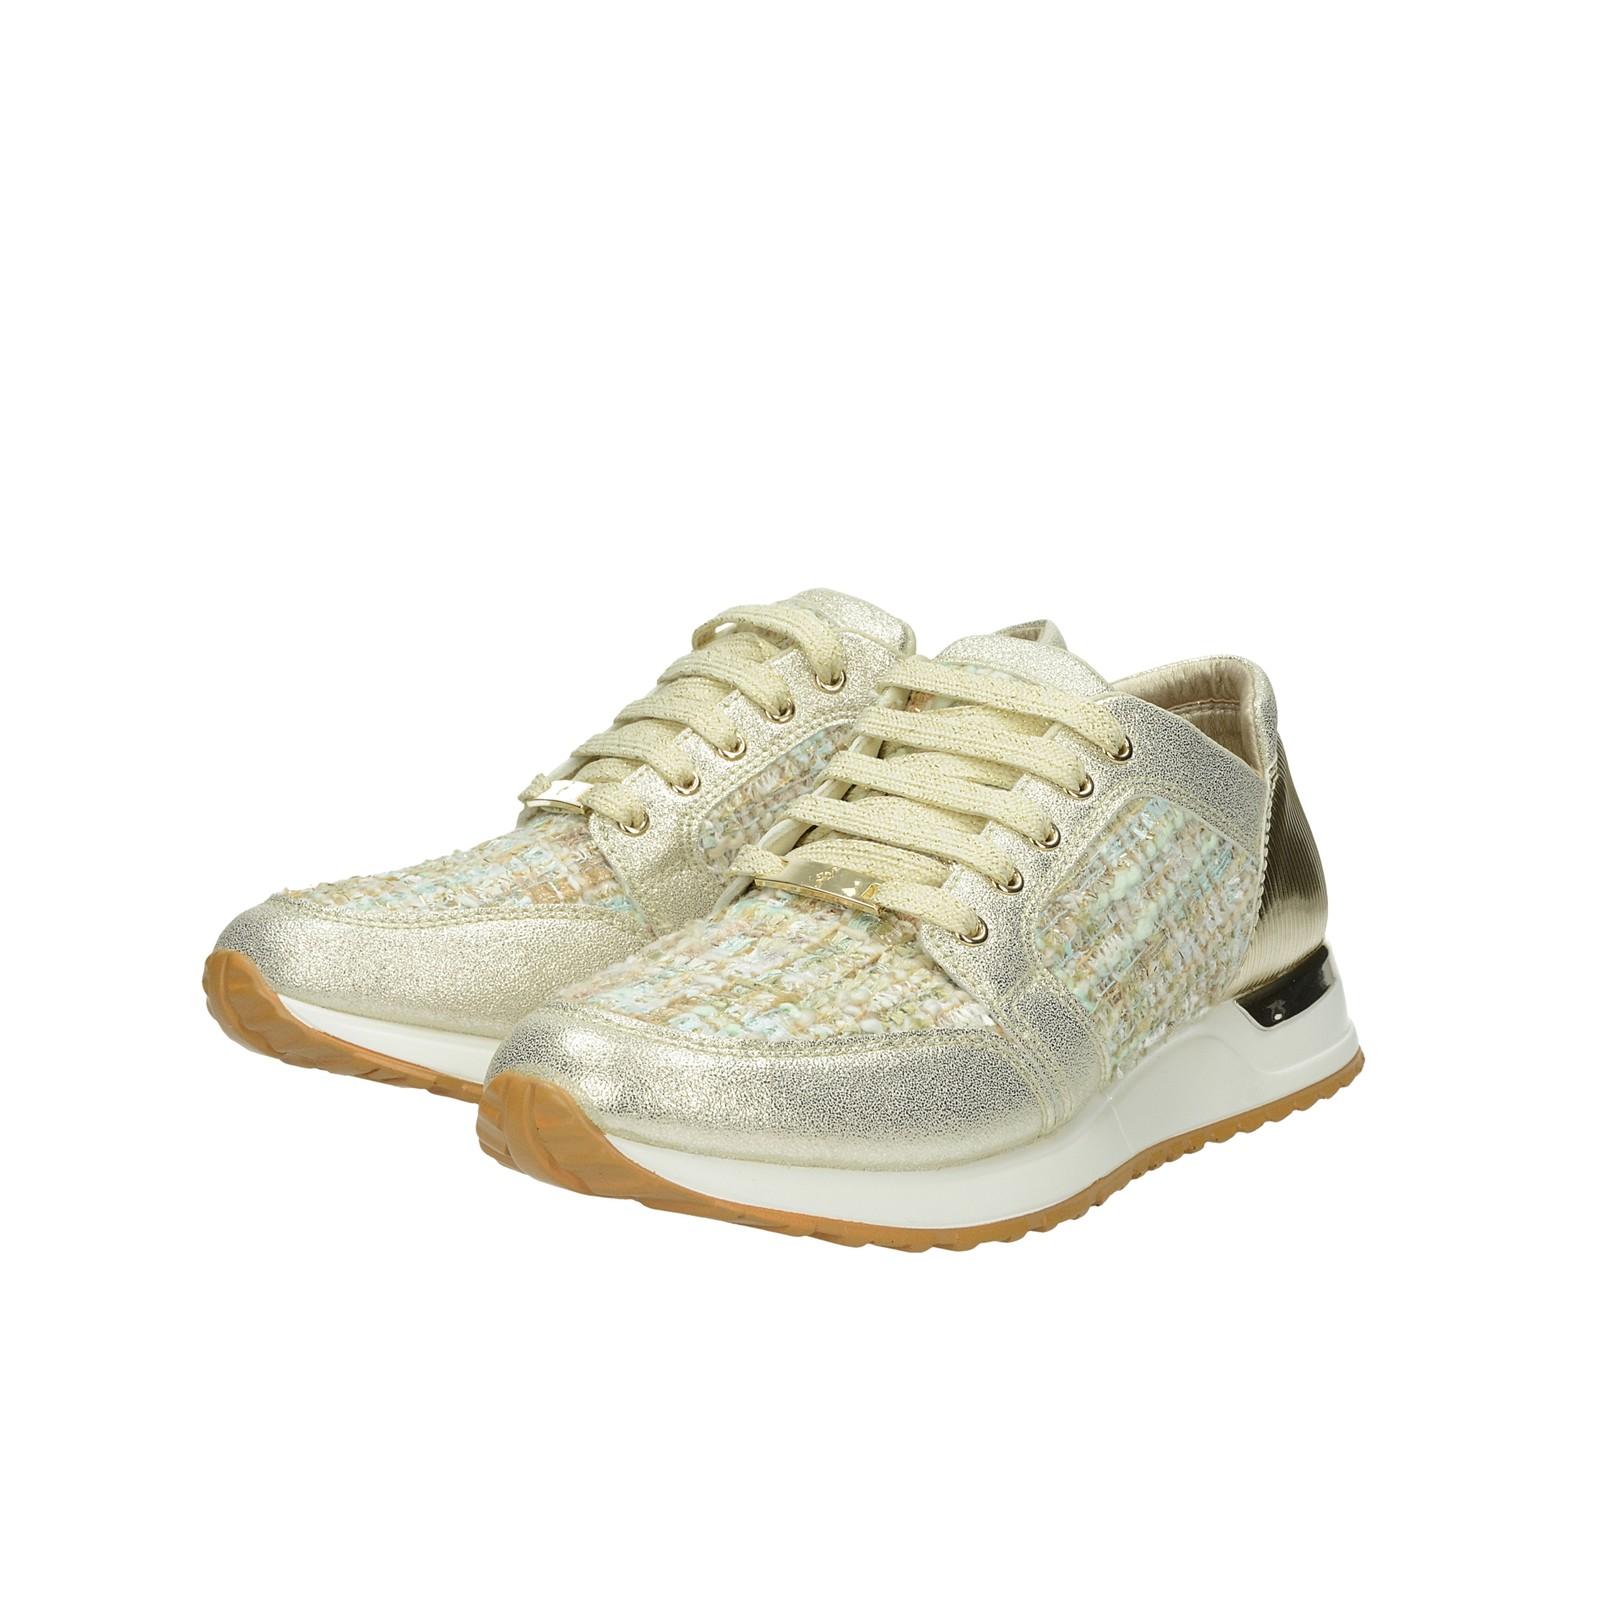 2640fc591 Menbur dámské stylové tenisky - zlaté   2046900-GOLD cz.robel.shoes